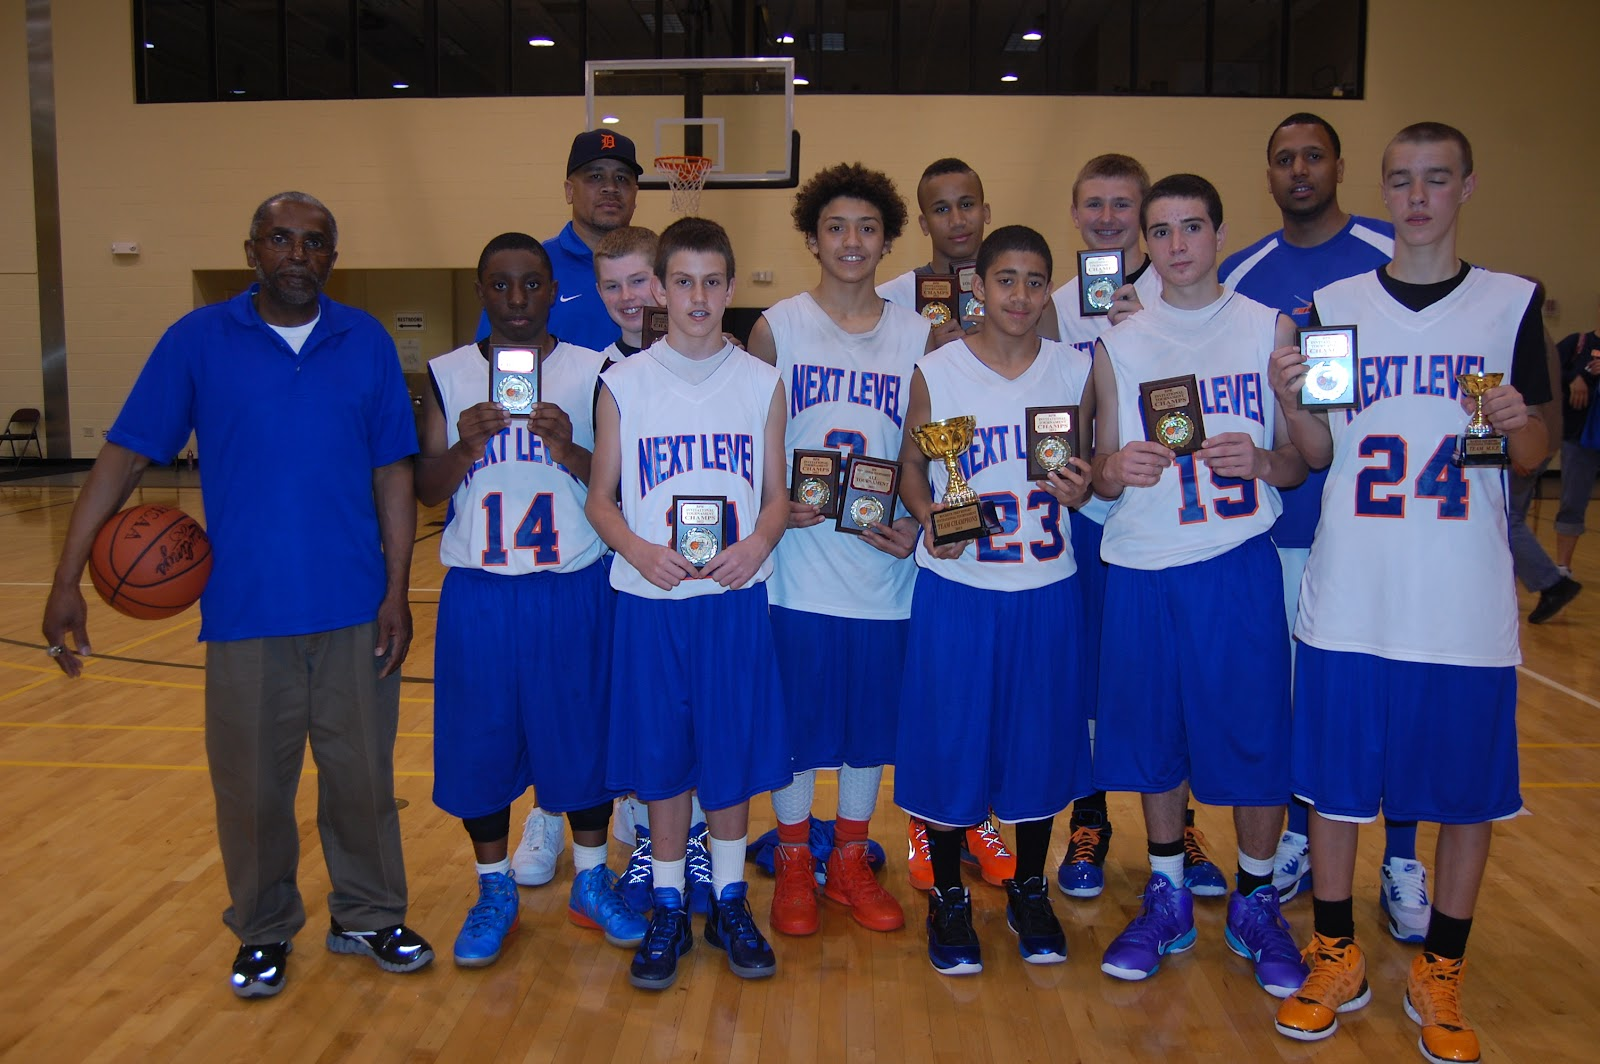 Dayton Metro Basketball | Basketball Scores